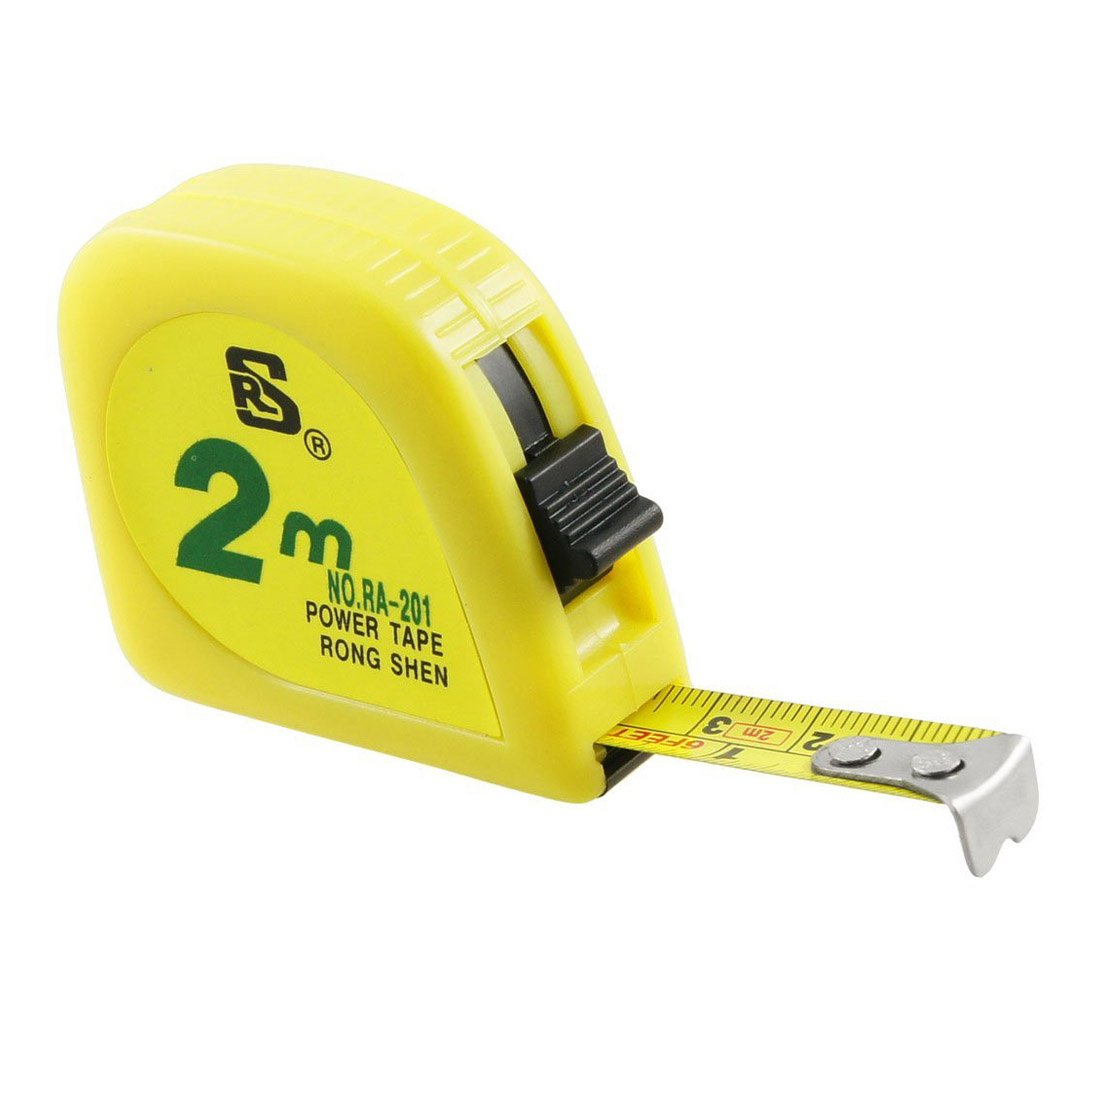 RETYLY Capsule de metal jaune 2 metres 6 FT ruban dechelle ruban a mesurer